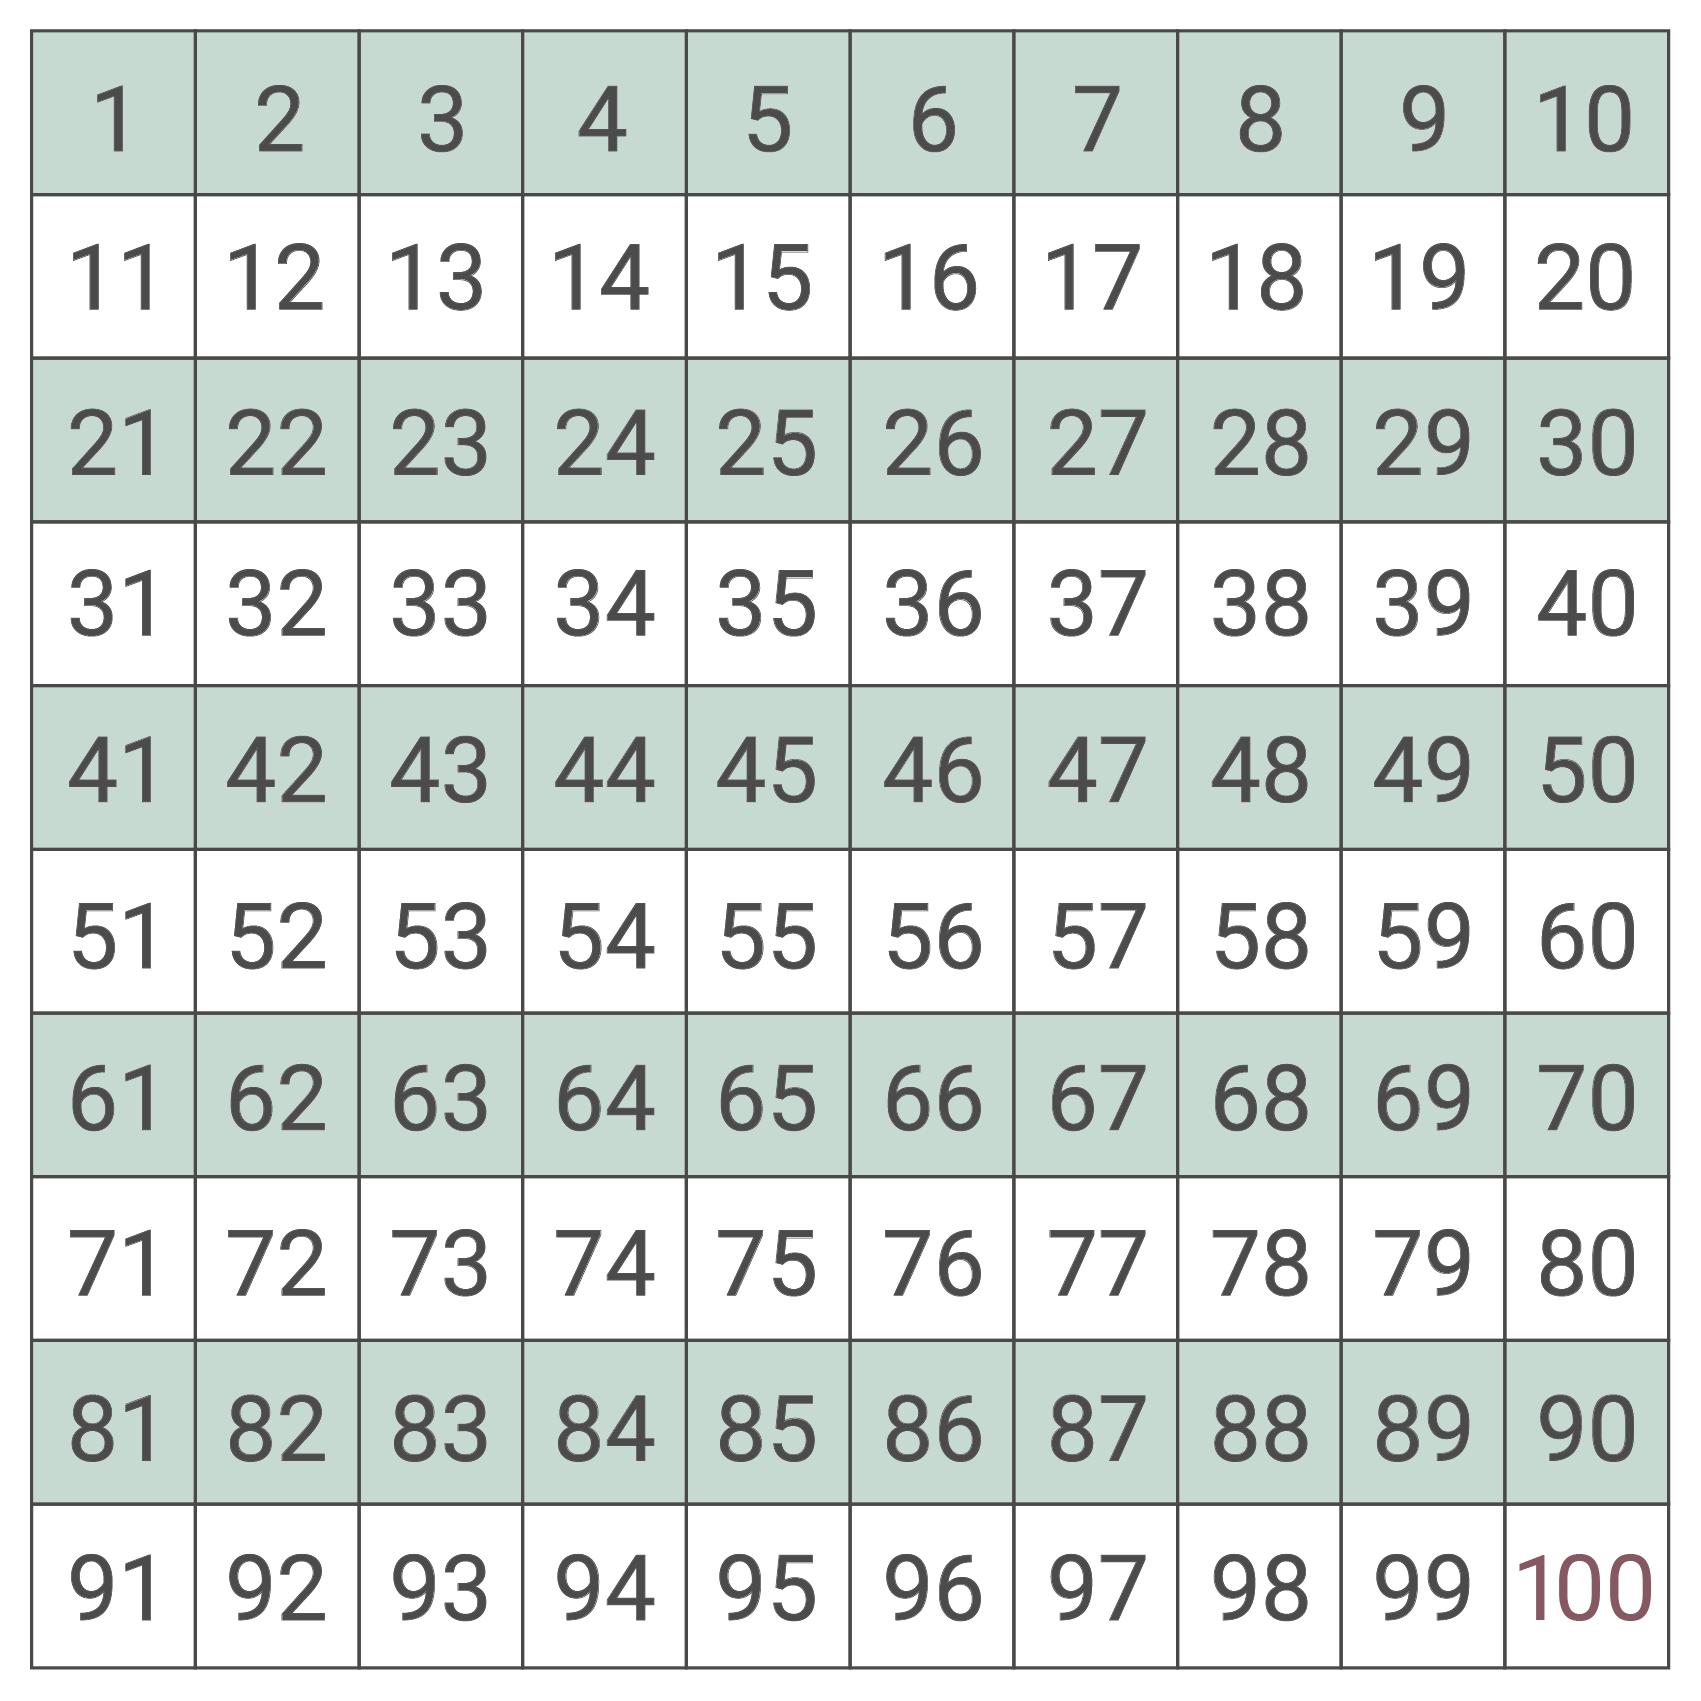 Taltavle-1-100-taltraening-matematik-indskoling-mellemtrin-laeringstavle-whiteboard-mutedesign